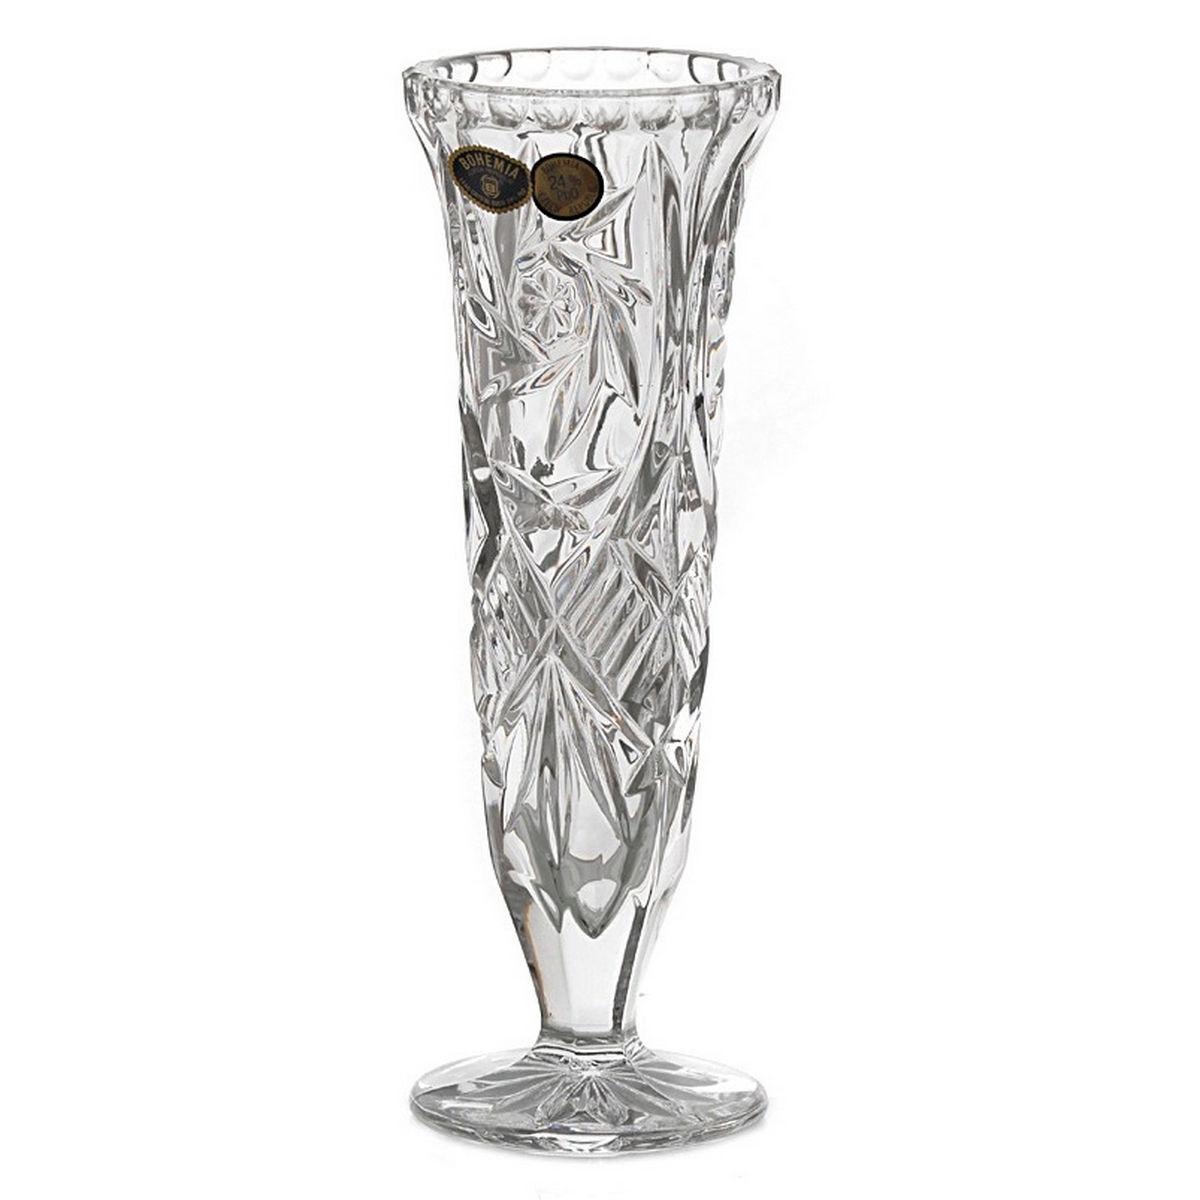 Vaza Cristal Bohemia 21 Cm 2021 aranjareamesei.ro